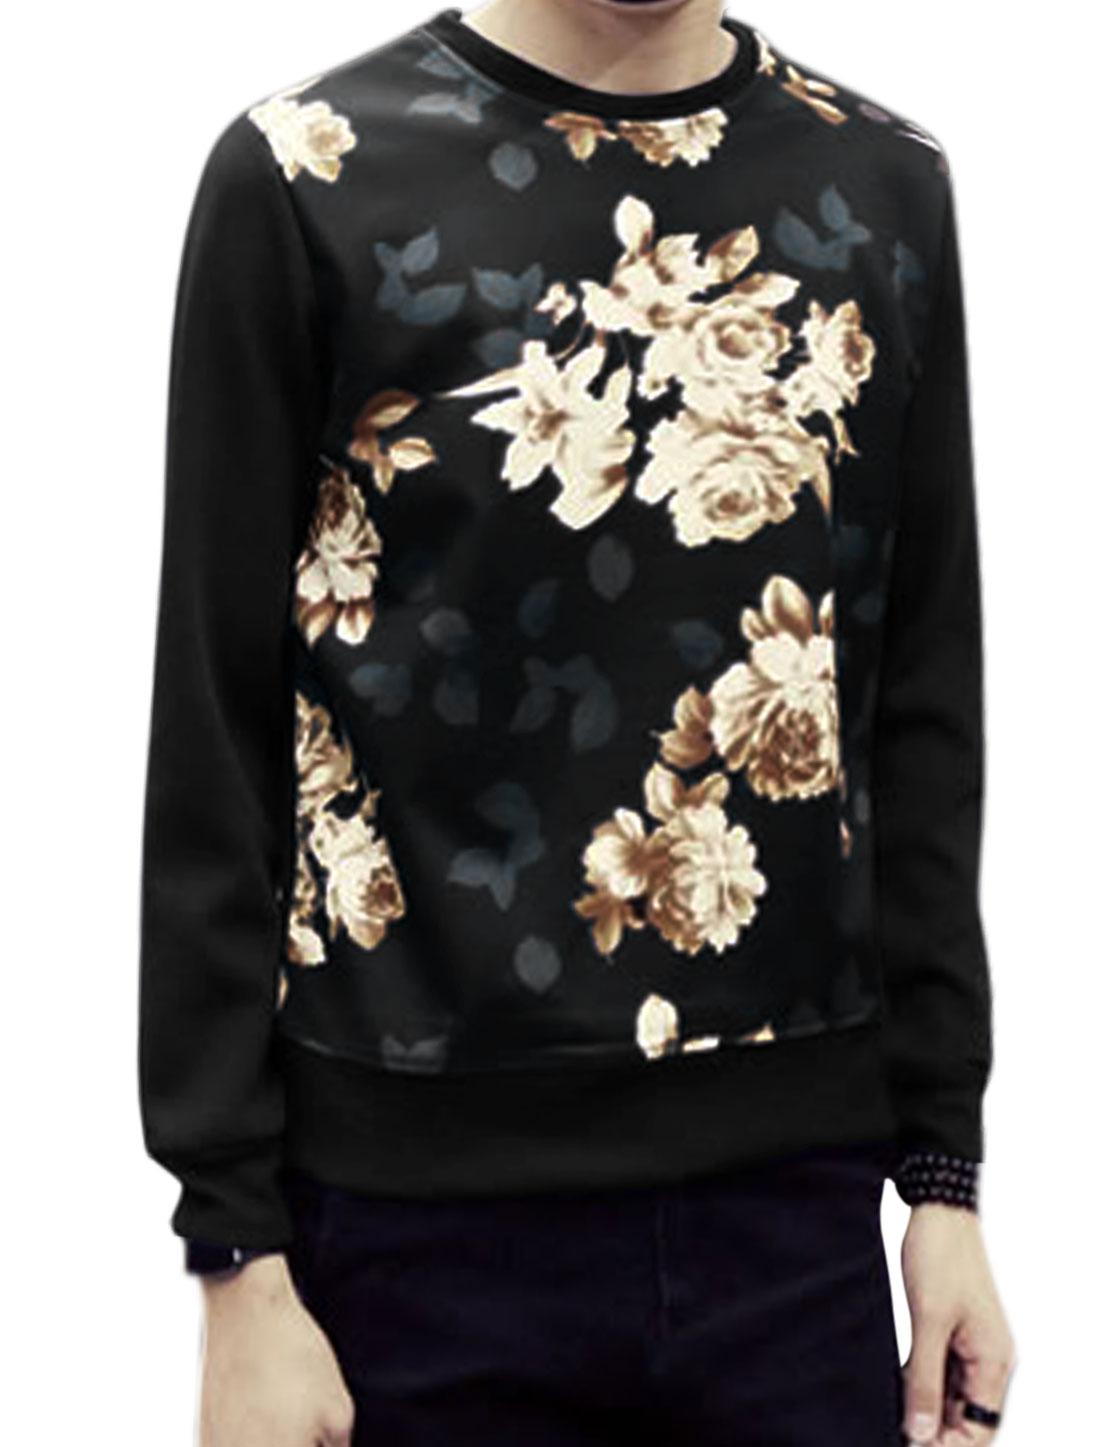 Men Crew Neck Long Sleeves Floral Prints Sweatshirt Black S